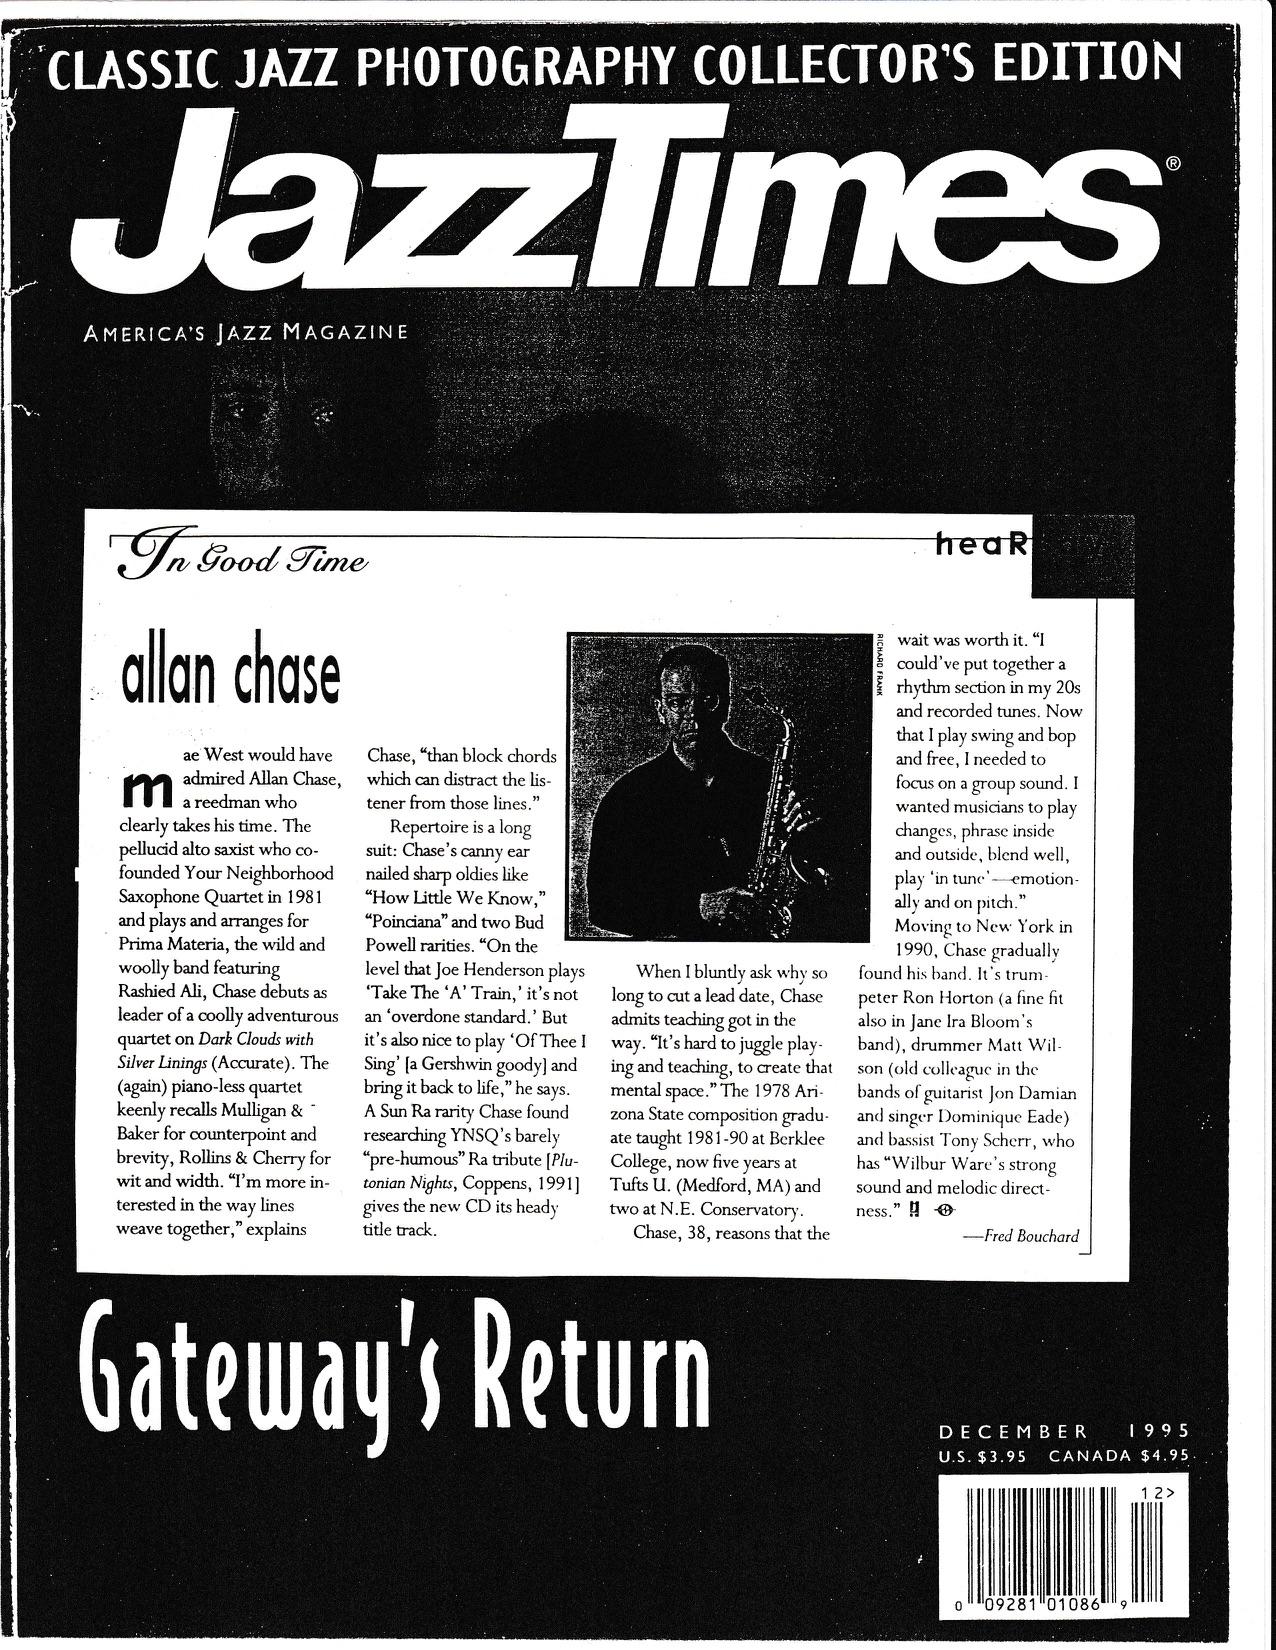 Fred Bouchard-Jazz Times 12.95-Dark Clouds CD Article.jpg